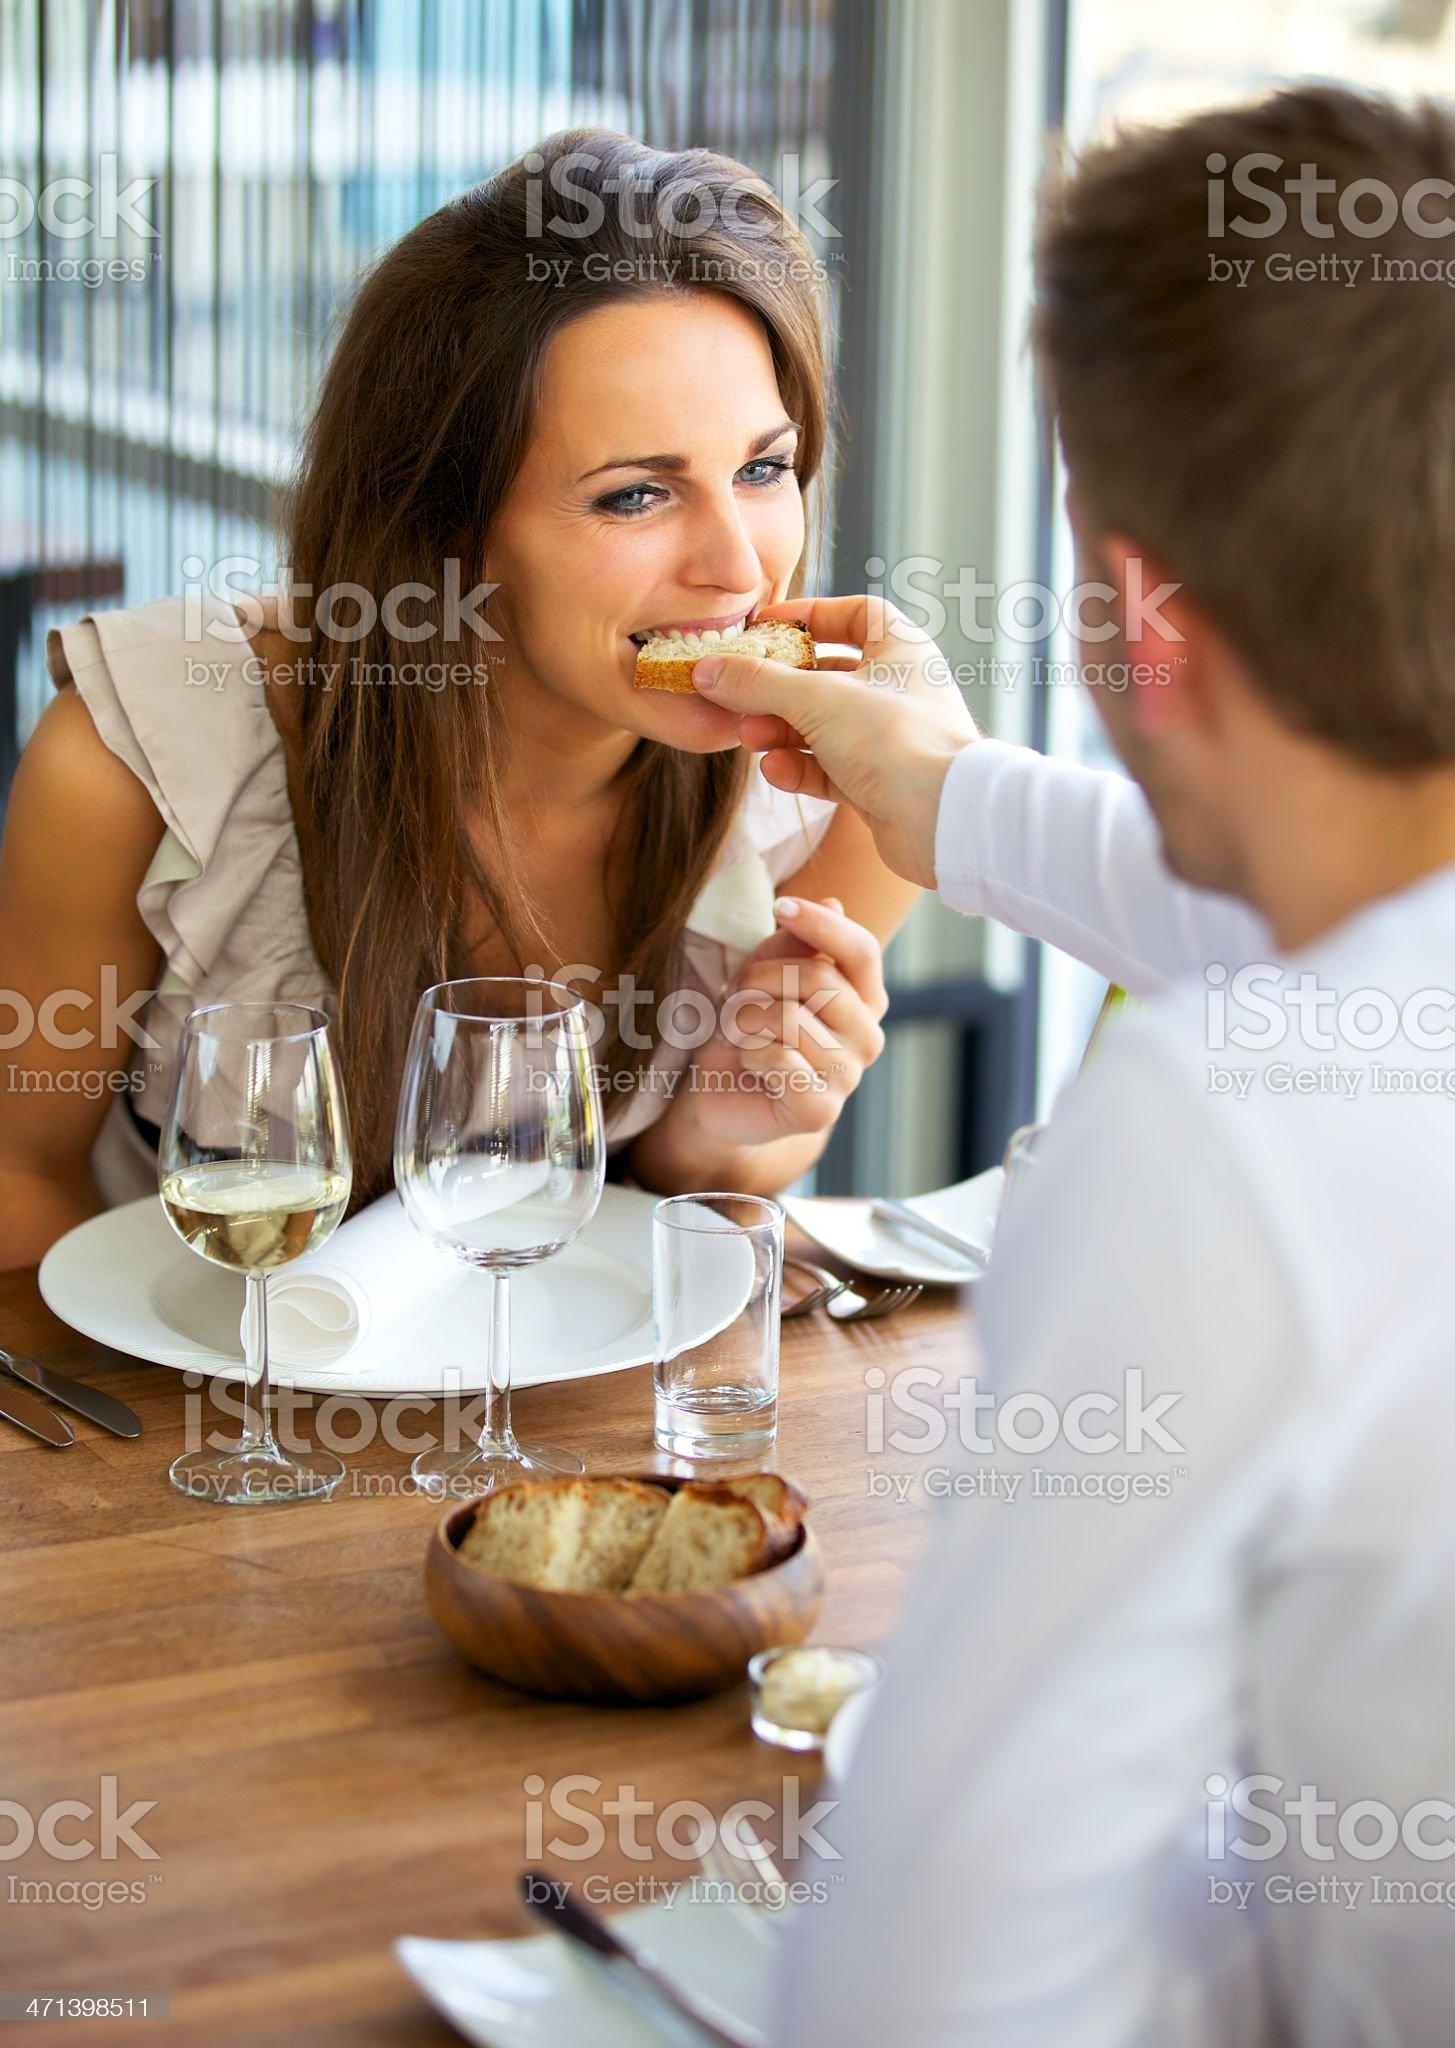 Man Feeding Bread to His Girlfriend royalty-free stock photo